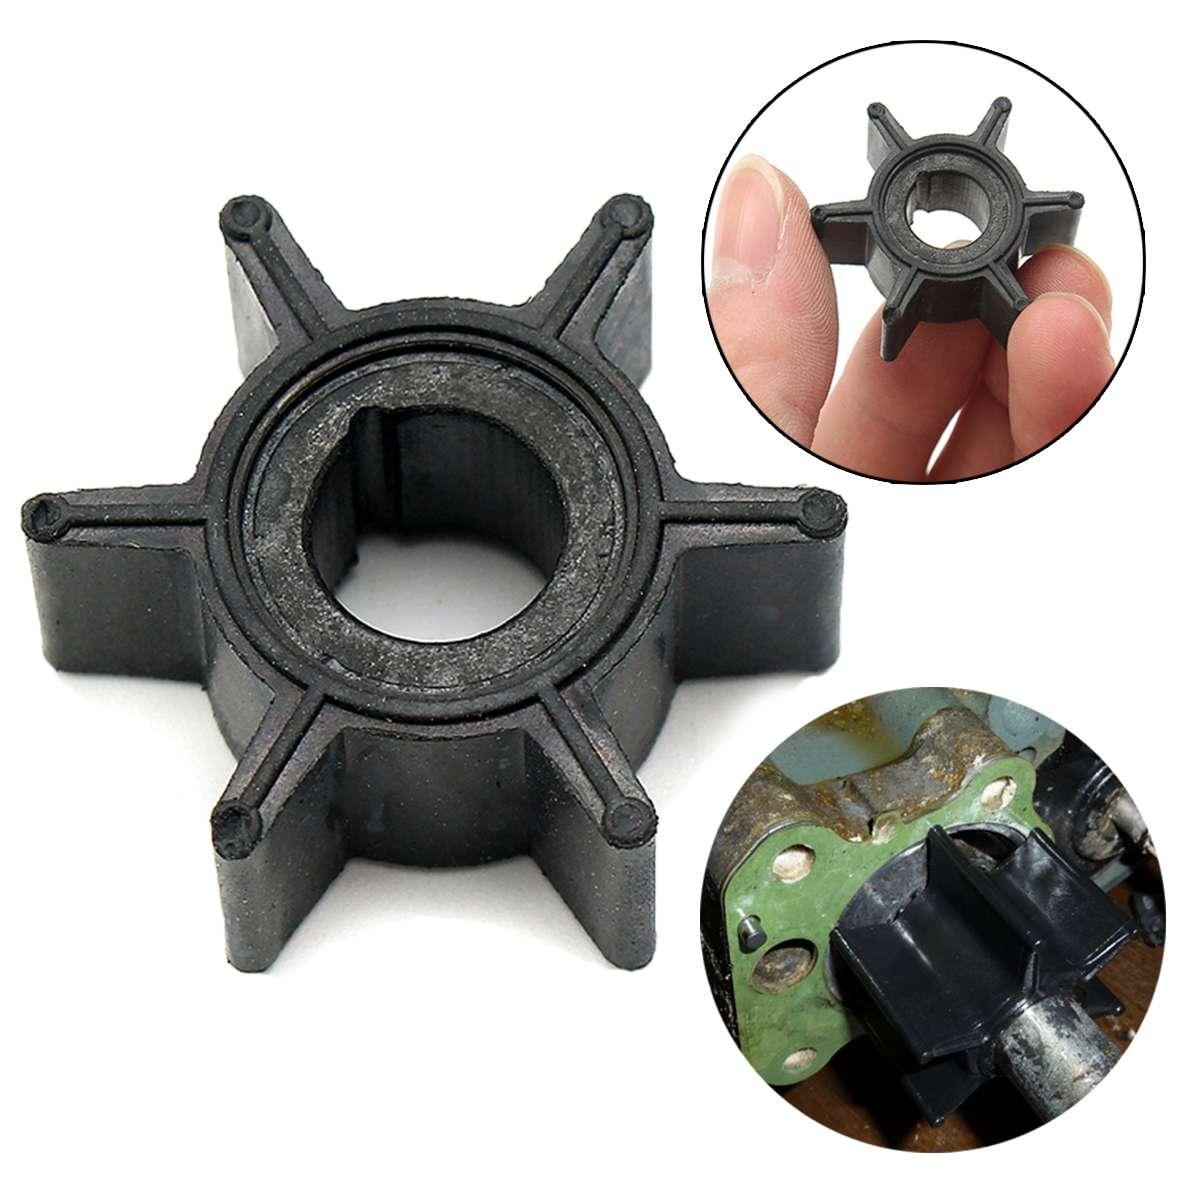 47-16154-3 impulsor de bomba de agua para Tohatsu/Mercury/Sierra 2/2. 5/3. 5/4/5/6HP Motor fuera de borda diámetro de goma 3,4 cm 6 cuchillas negro